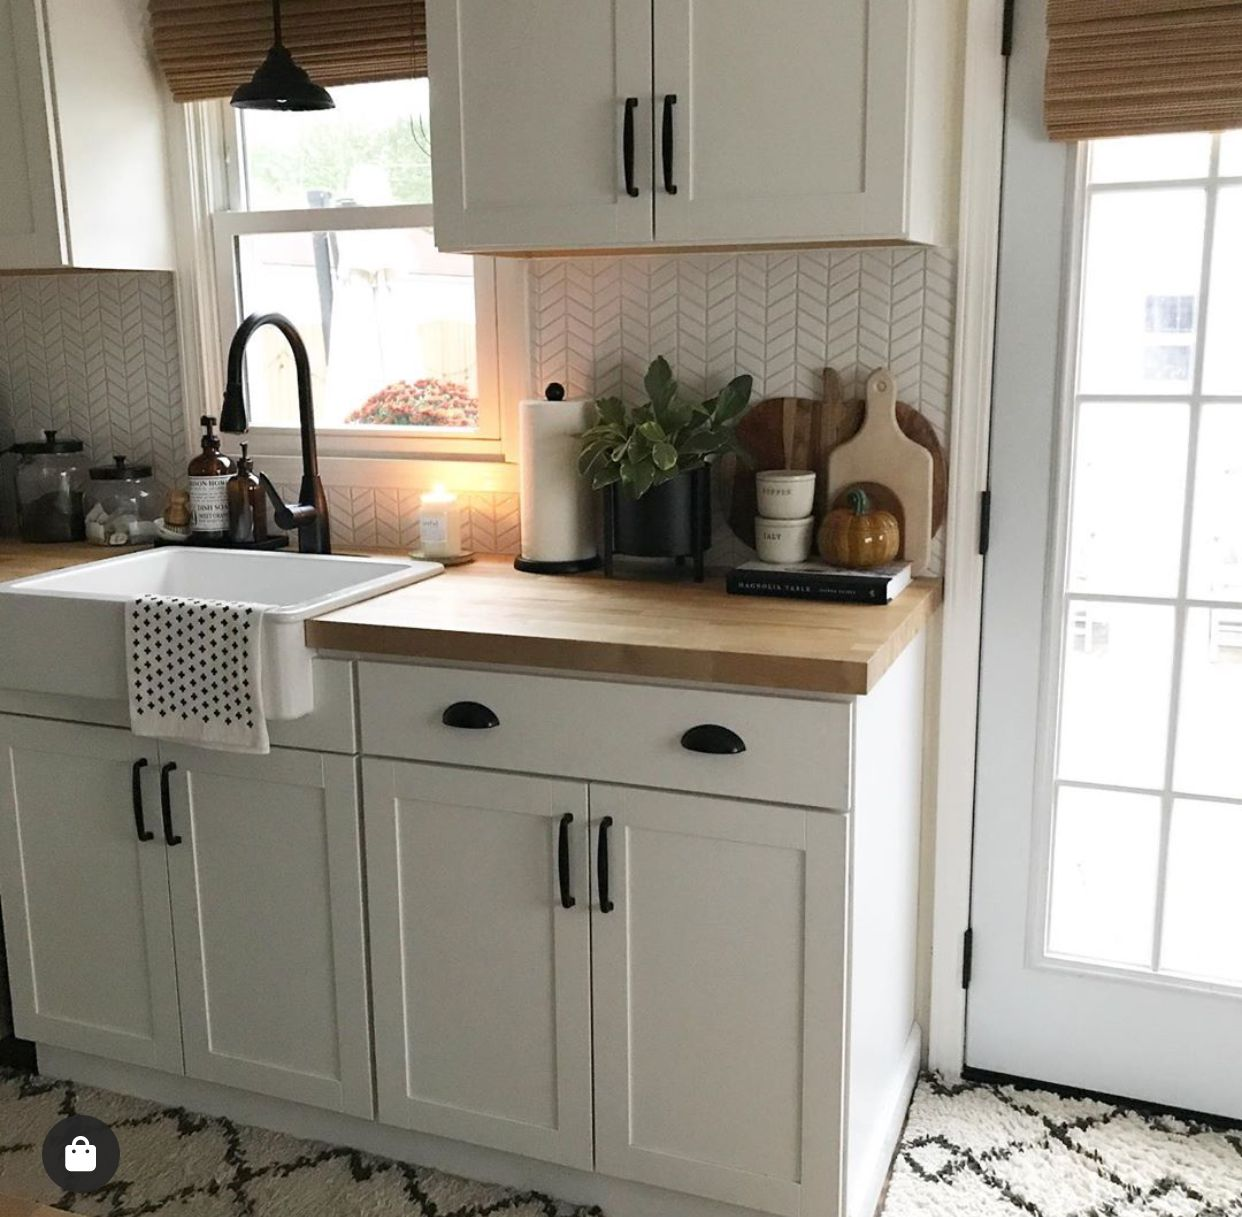 Small kitchen | Small kitchen renovations, Small kitchen ...